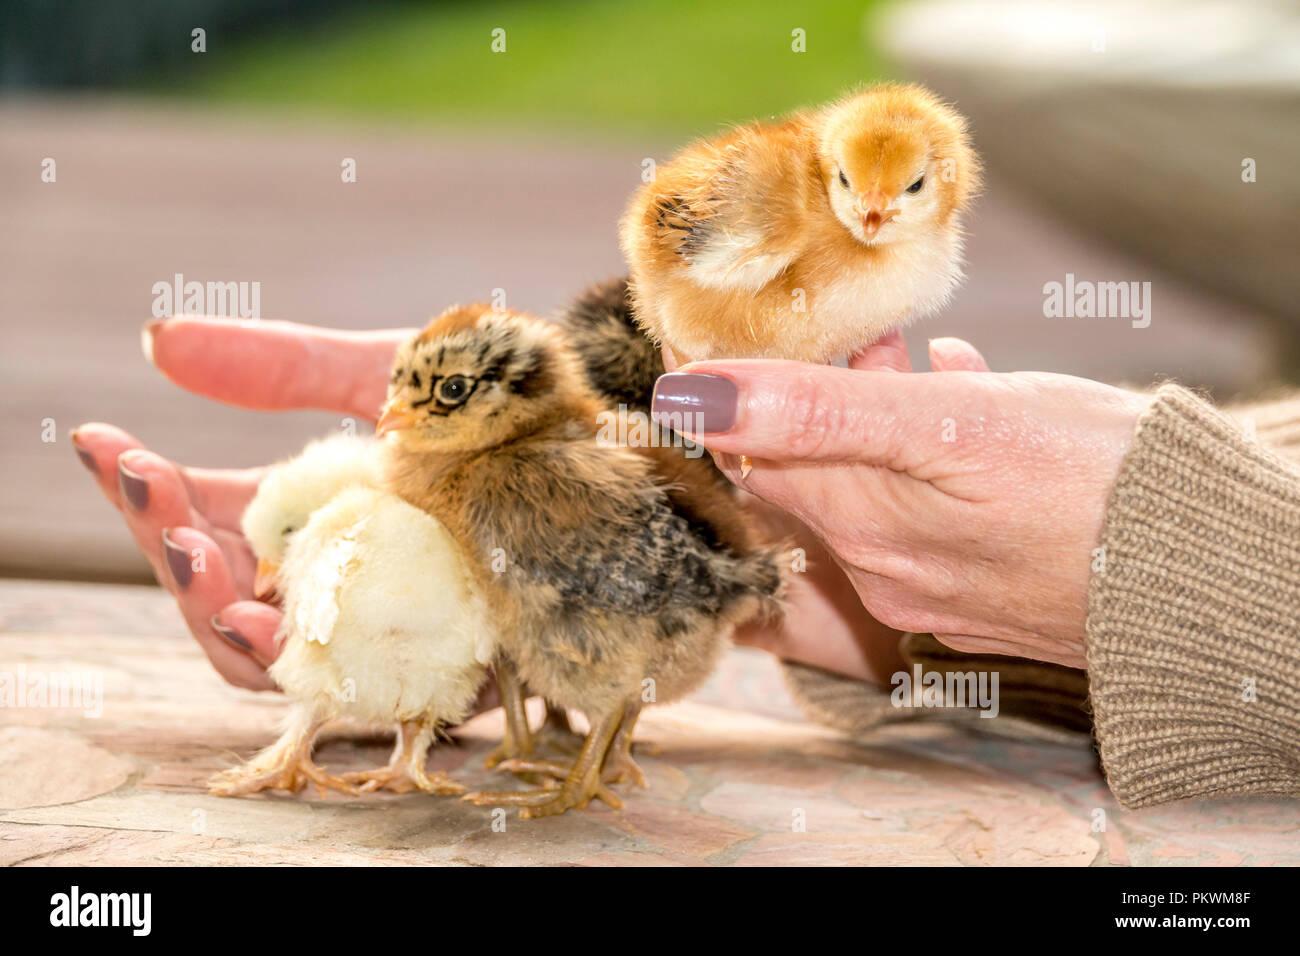 Small Chicken Chicks Baby Cute Chickens Stock Photo